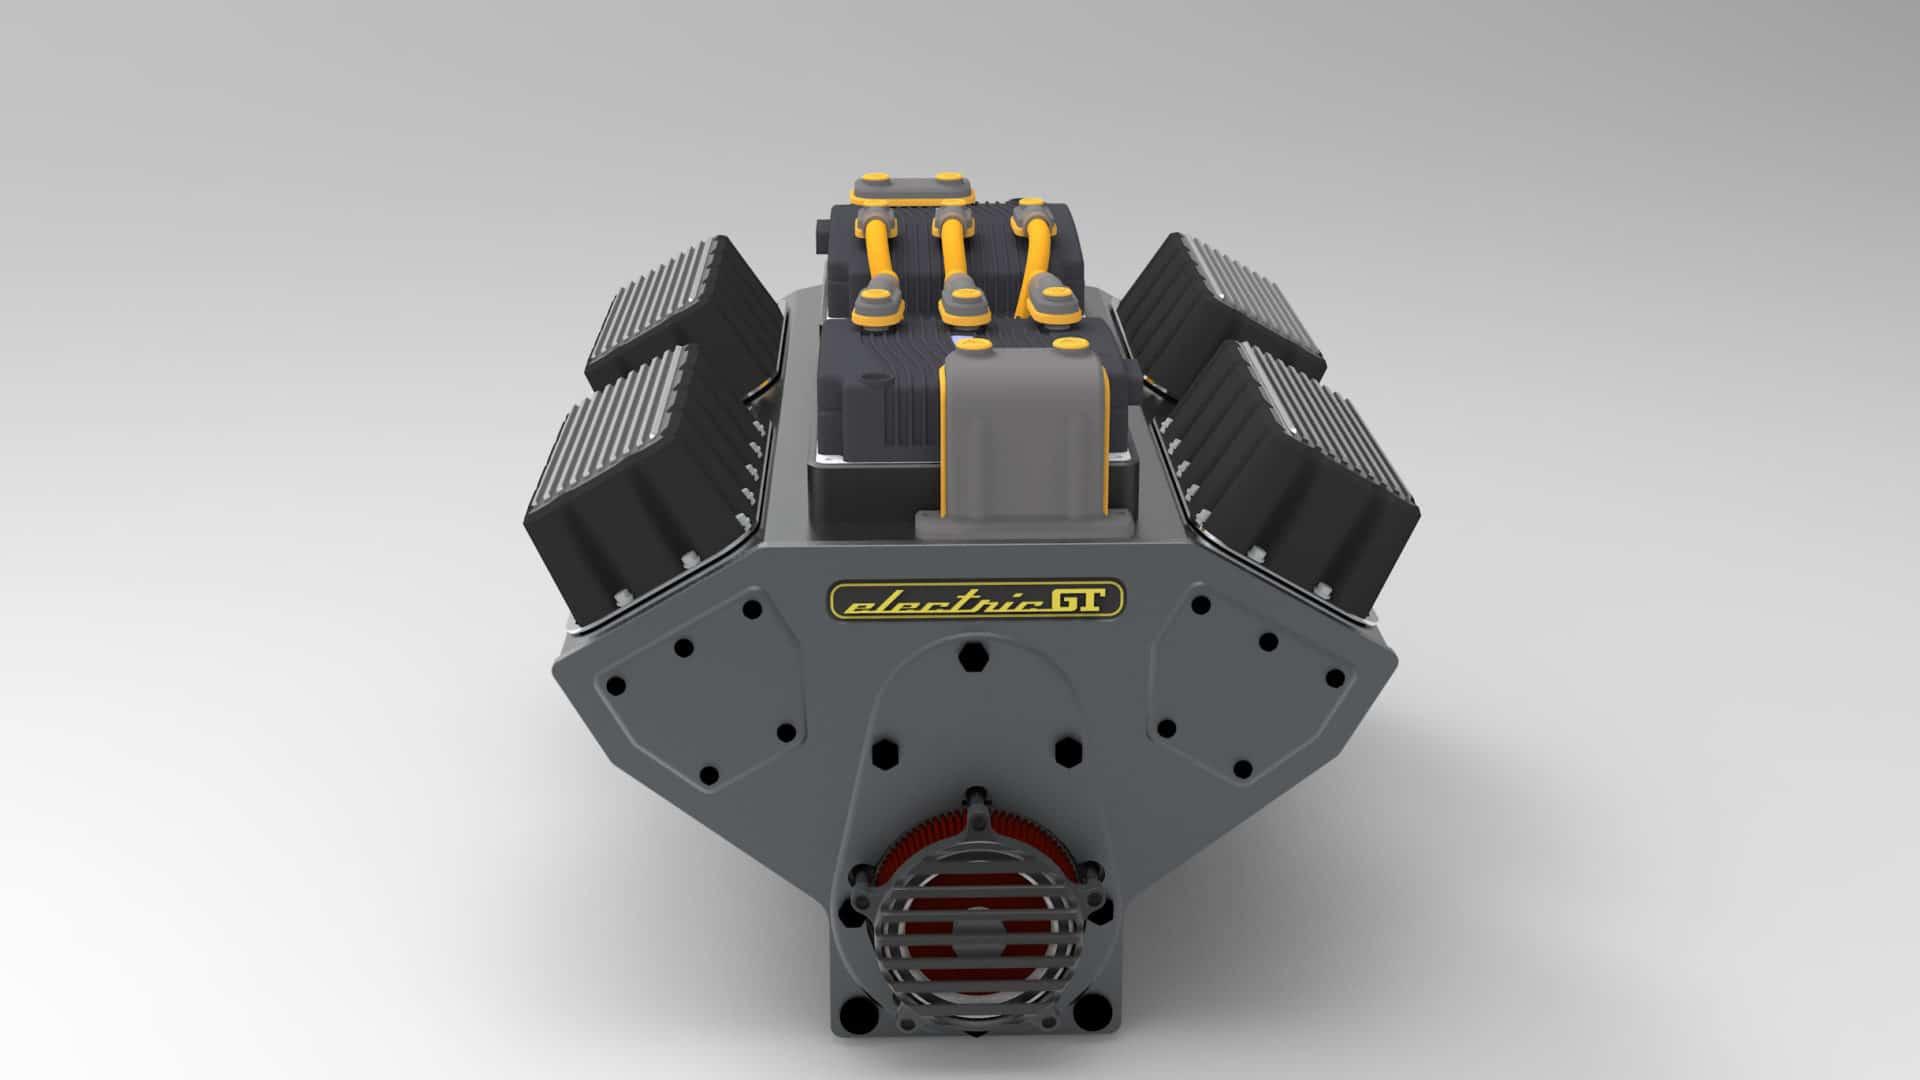 Electric GT create electric motor